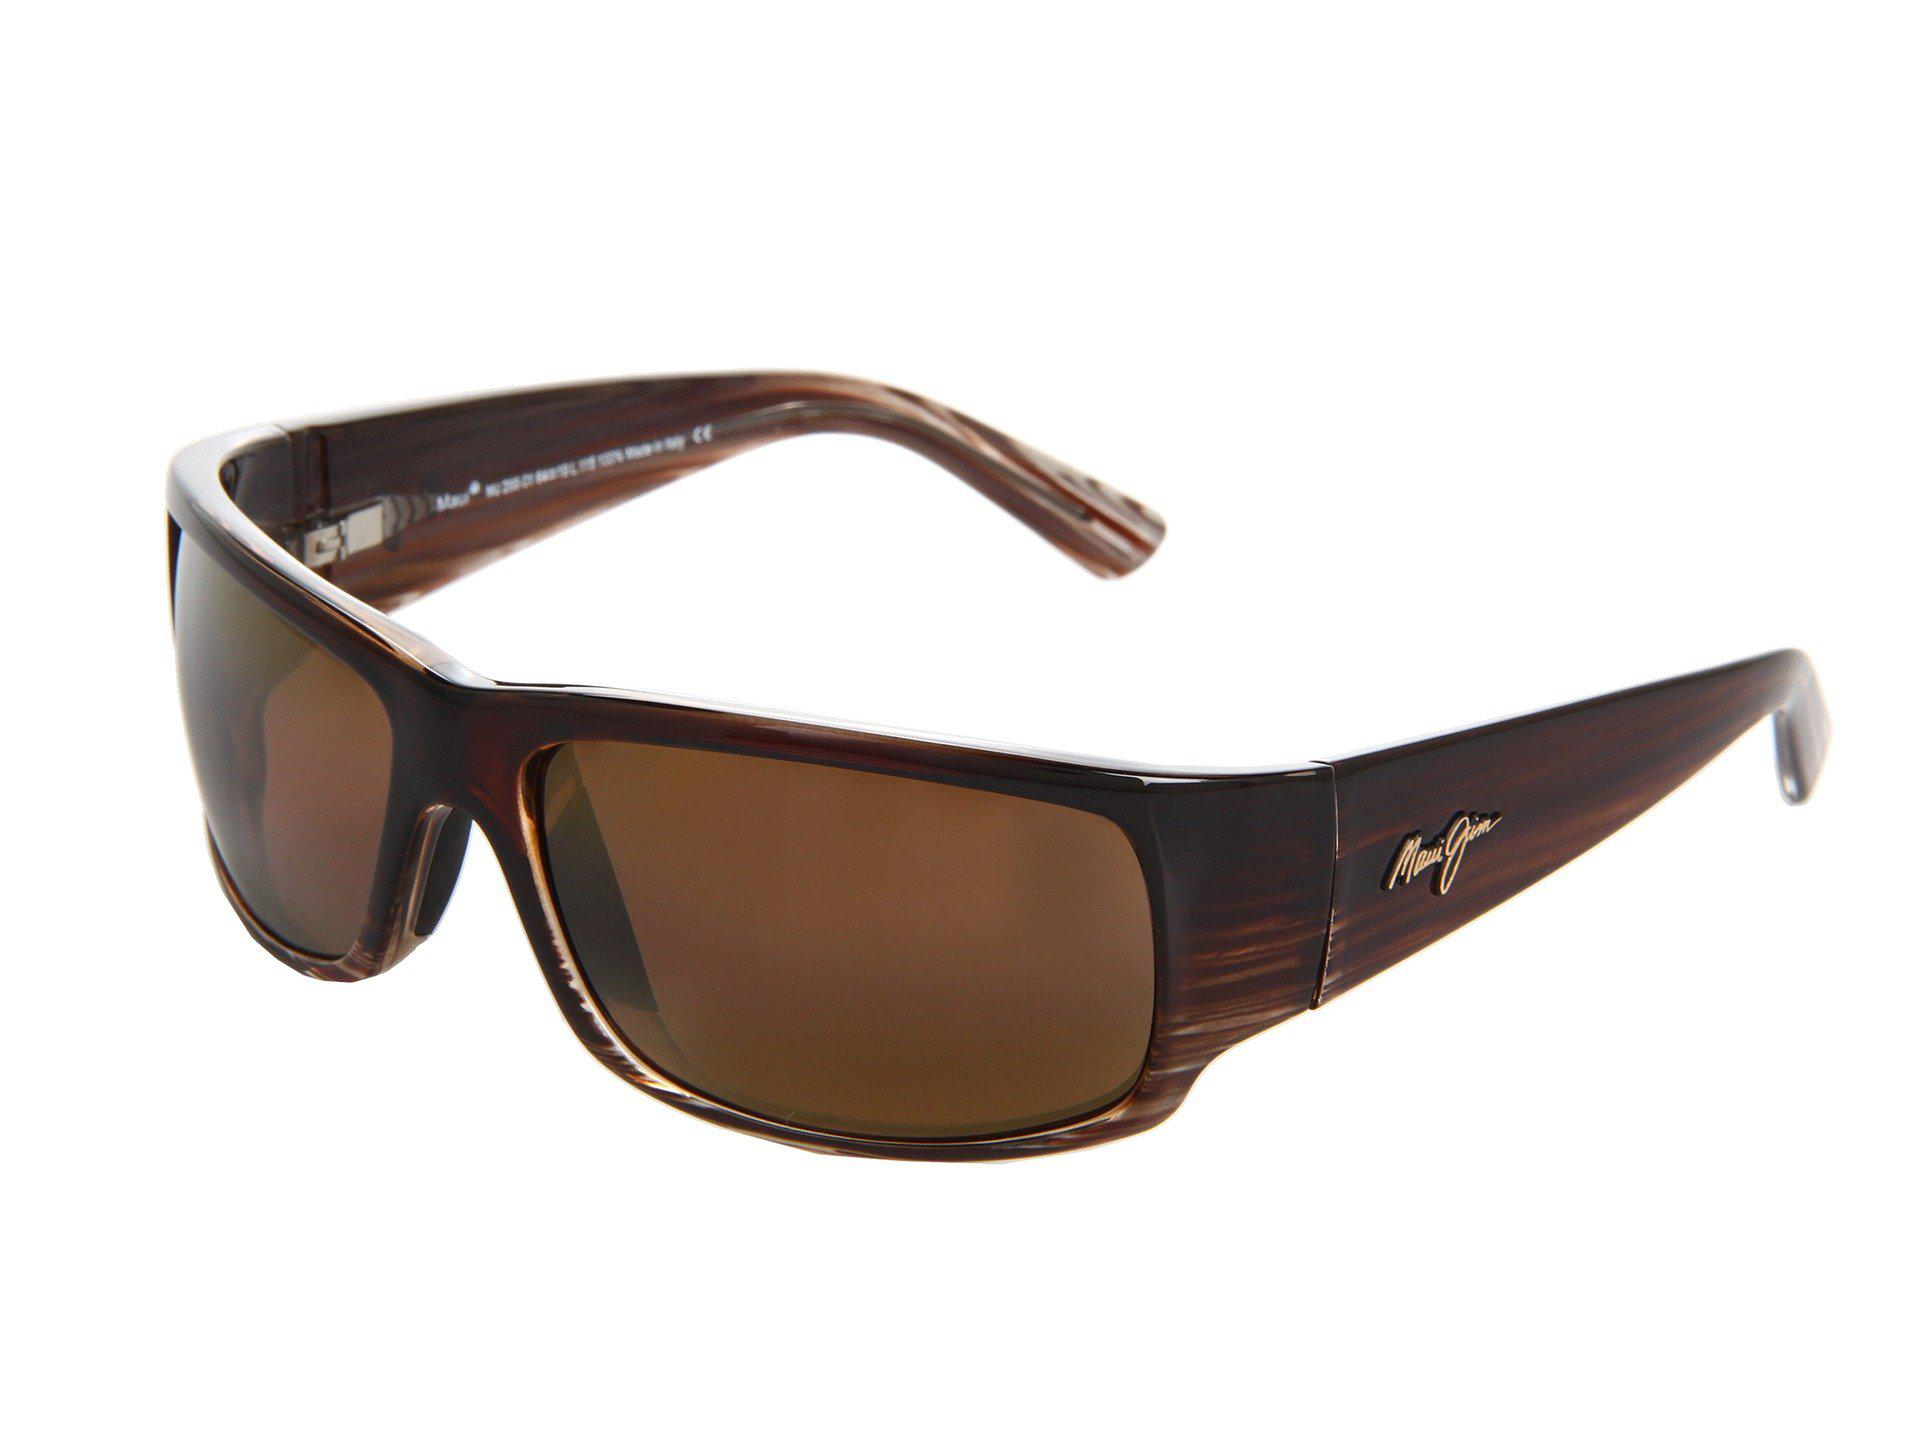 9e8cb7f725b Maui Jim. Women s Brown World Cup (chocolate Stripe Fade hcl Bronze) Sport  Sunglasses